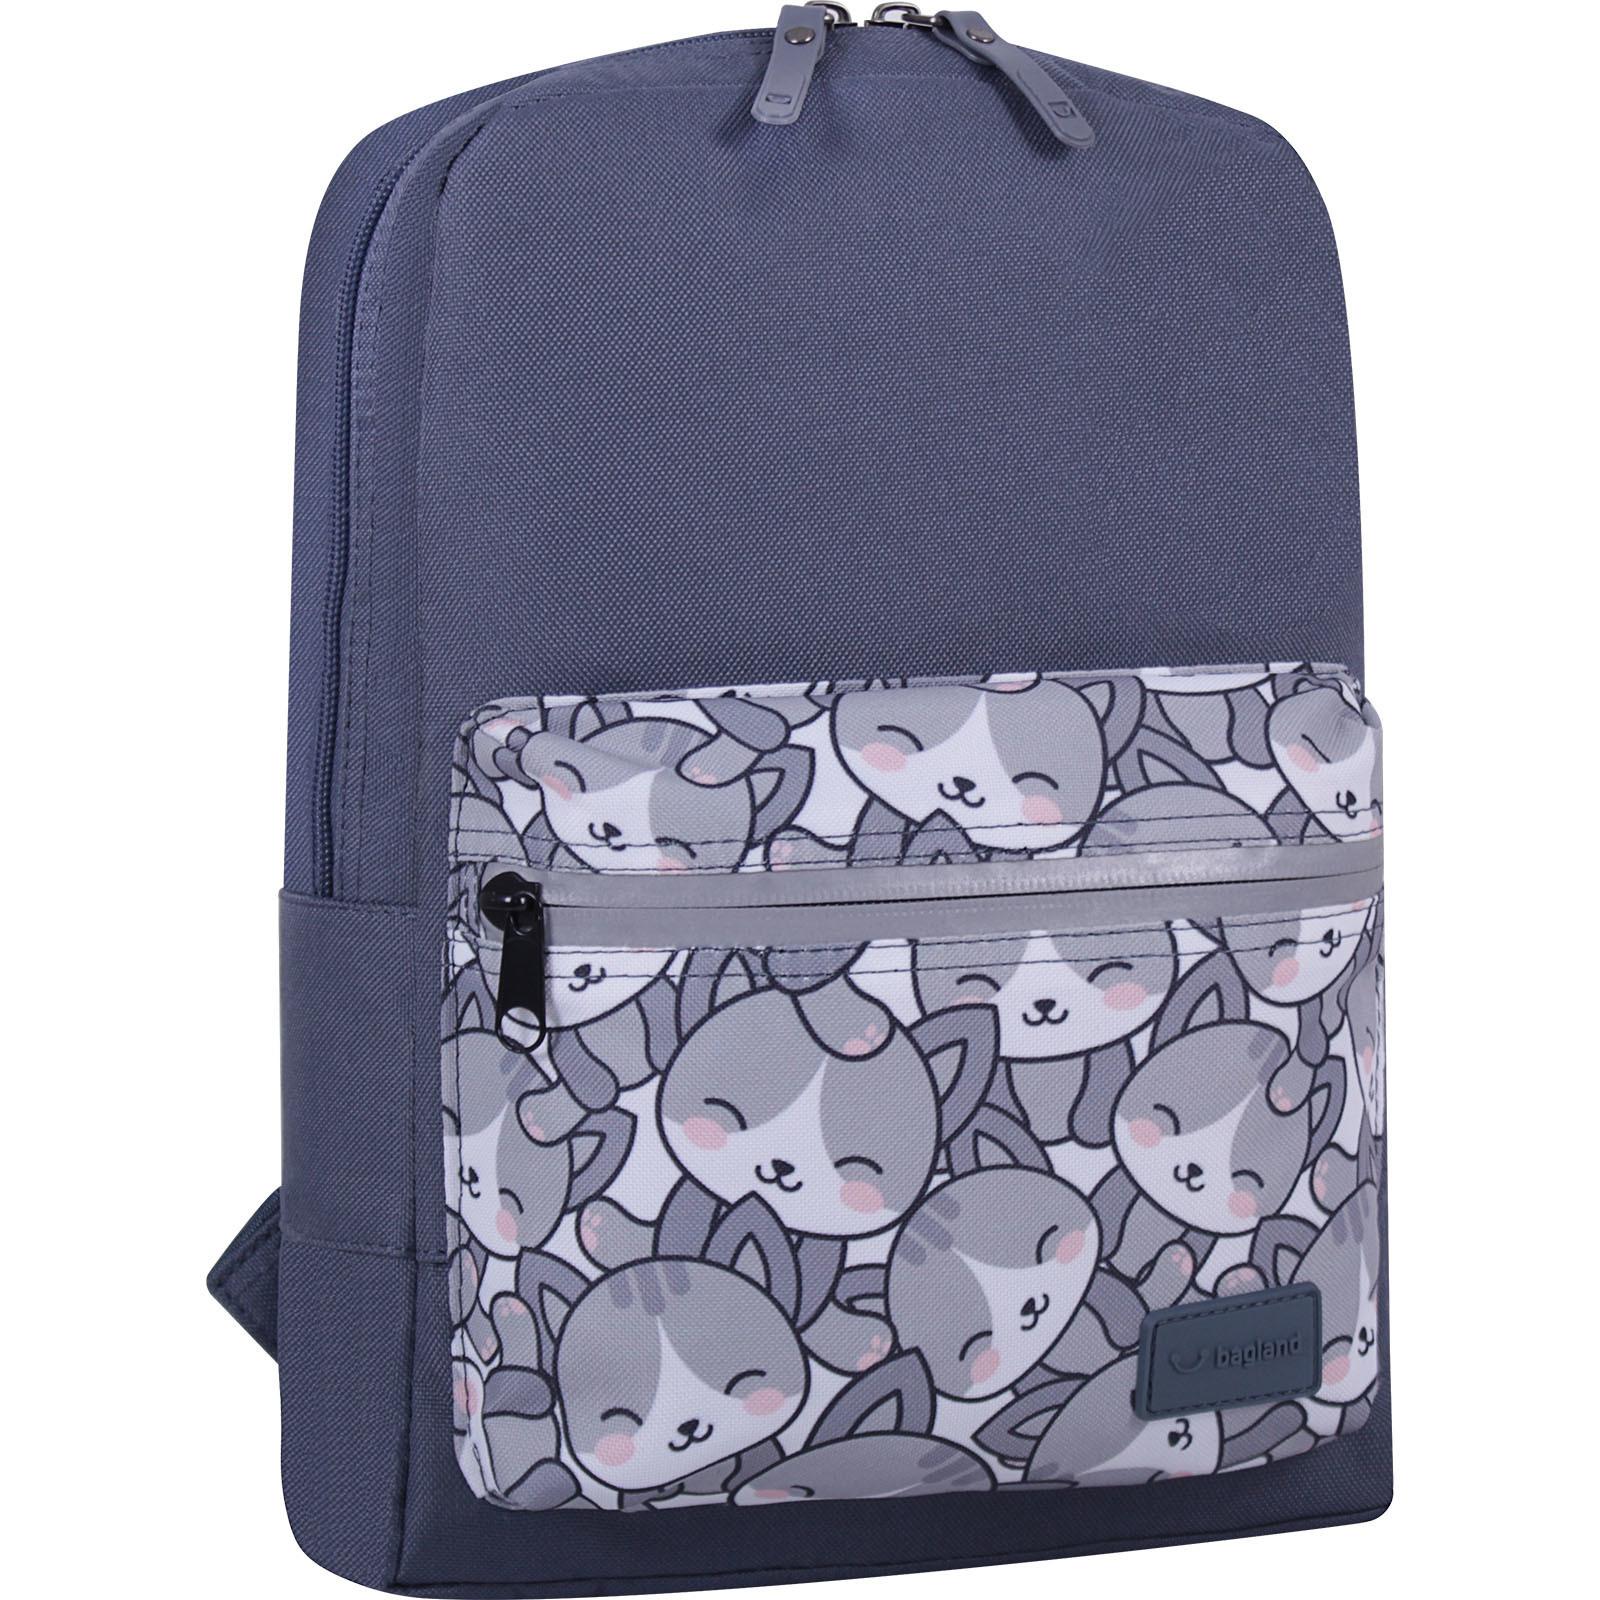 Молодежные рюкзаки Рюкзак Bagland Молодежный mini 8 л. серый 756 (0050866) IMG_6755_суб756_-1600.jpg